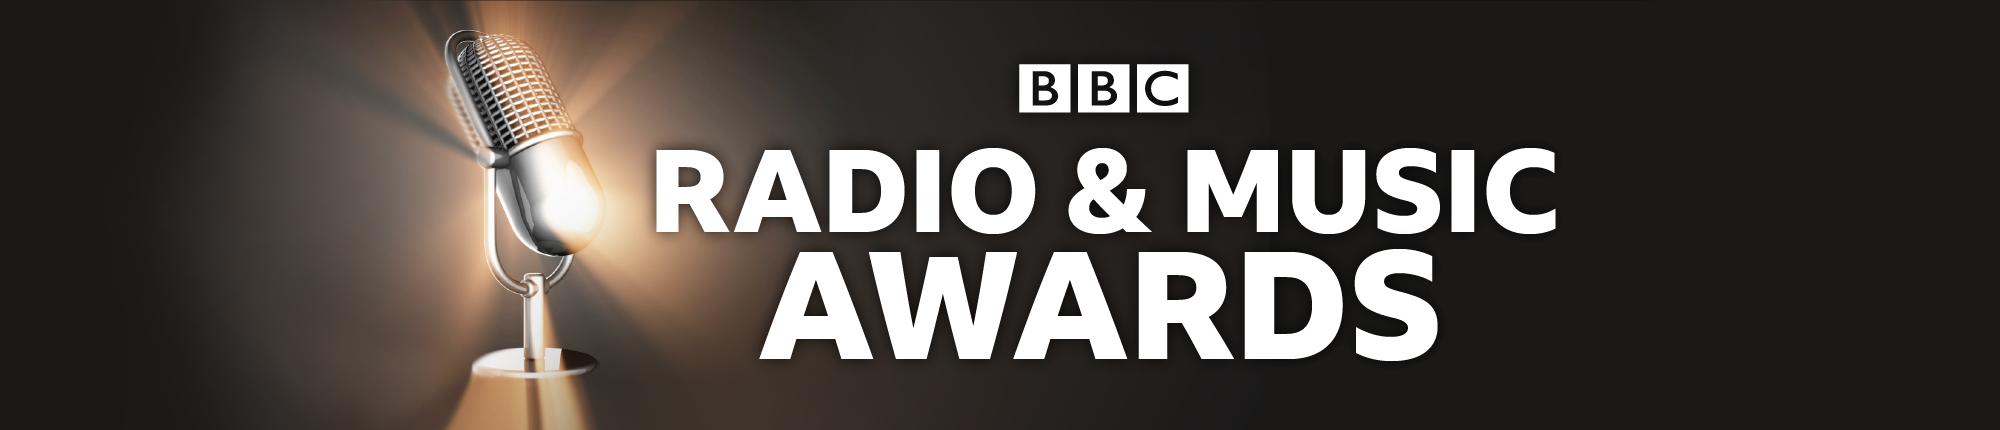 BBC Radio & Music Awards